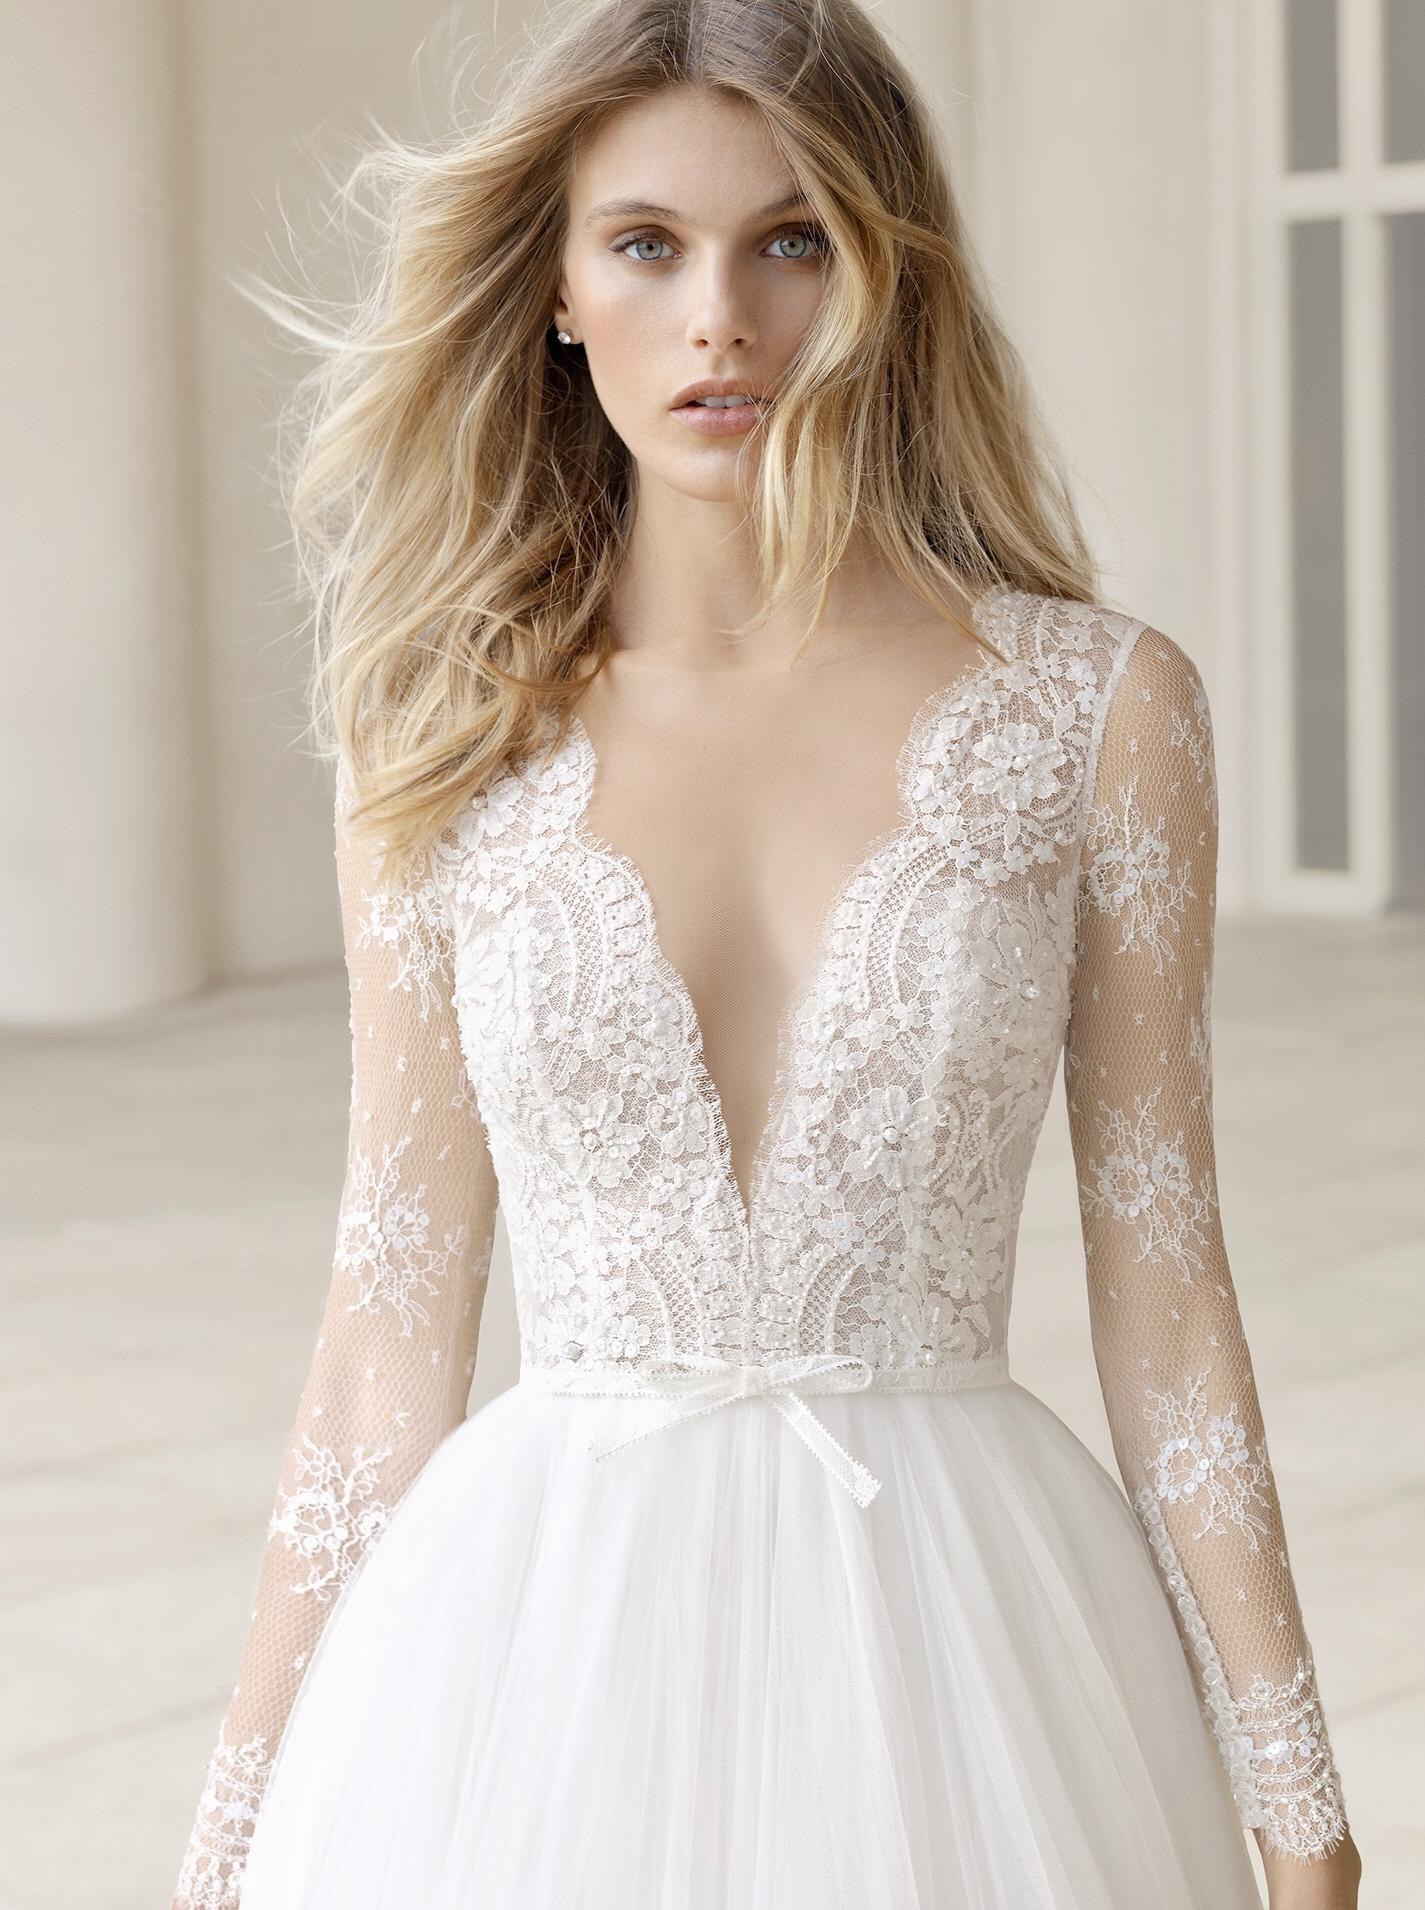 plus size wedding dresses nyc photo - 1